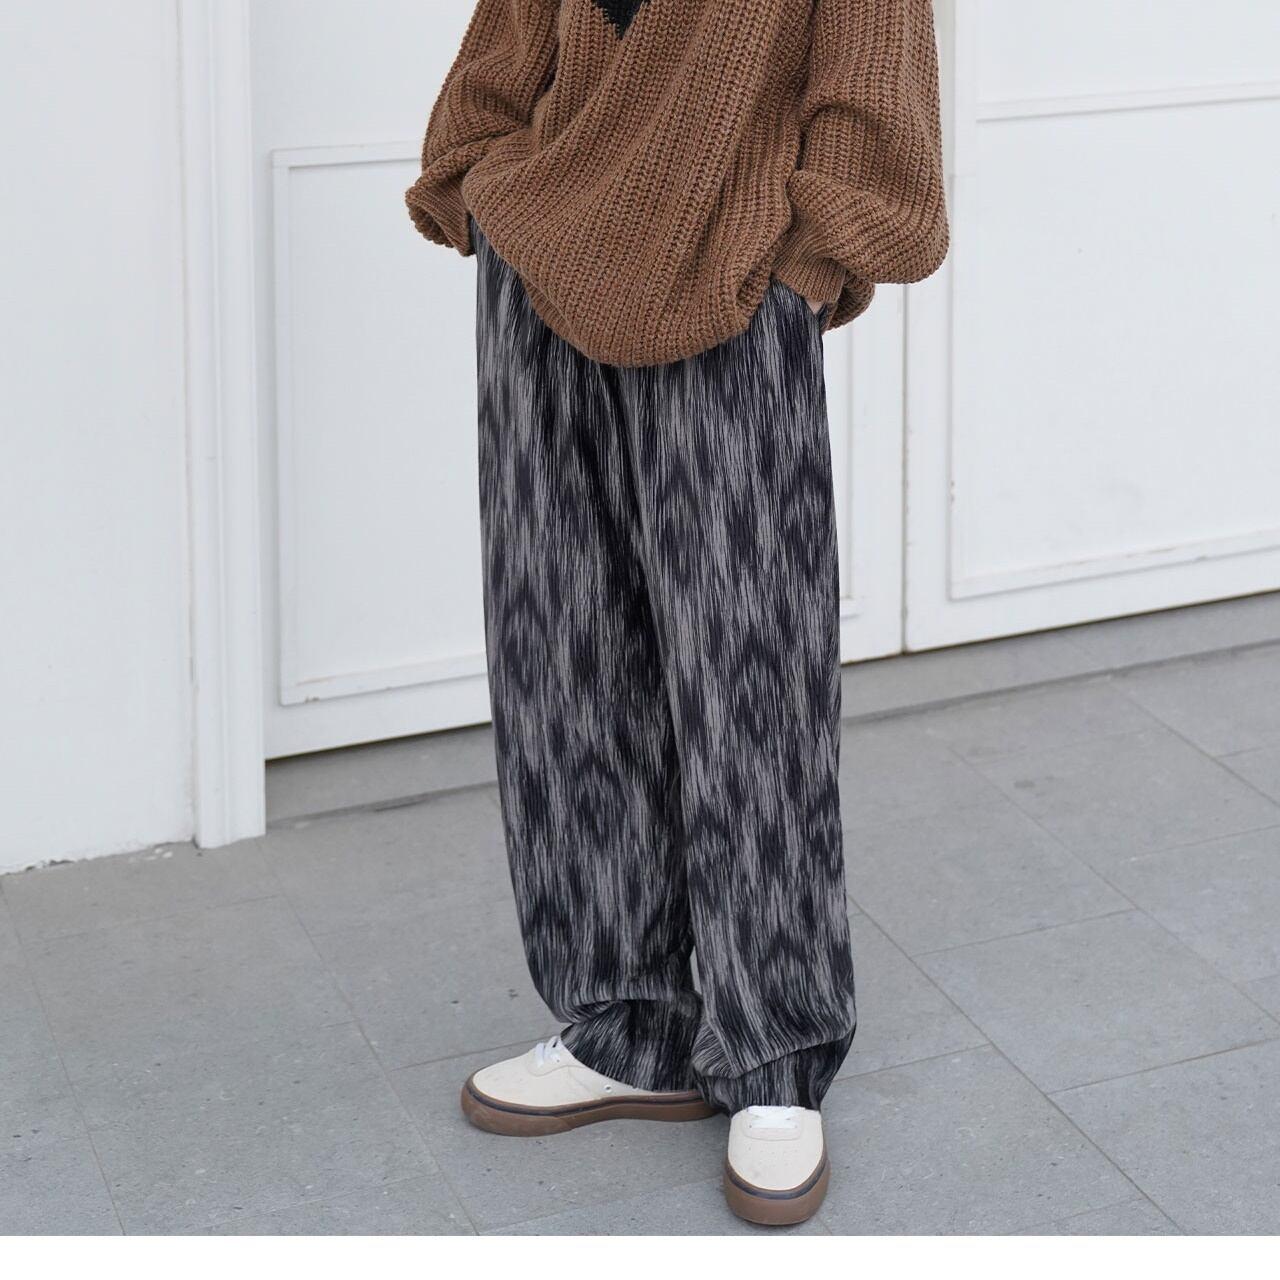 Tie dye stretch pants(タイダイストレッチパンツ)a-977